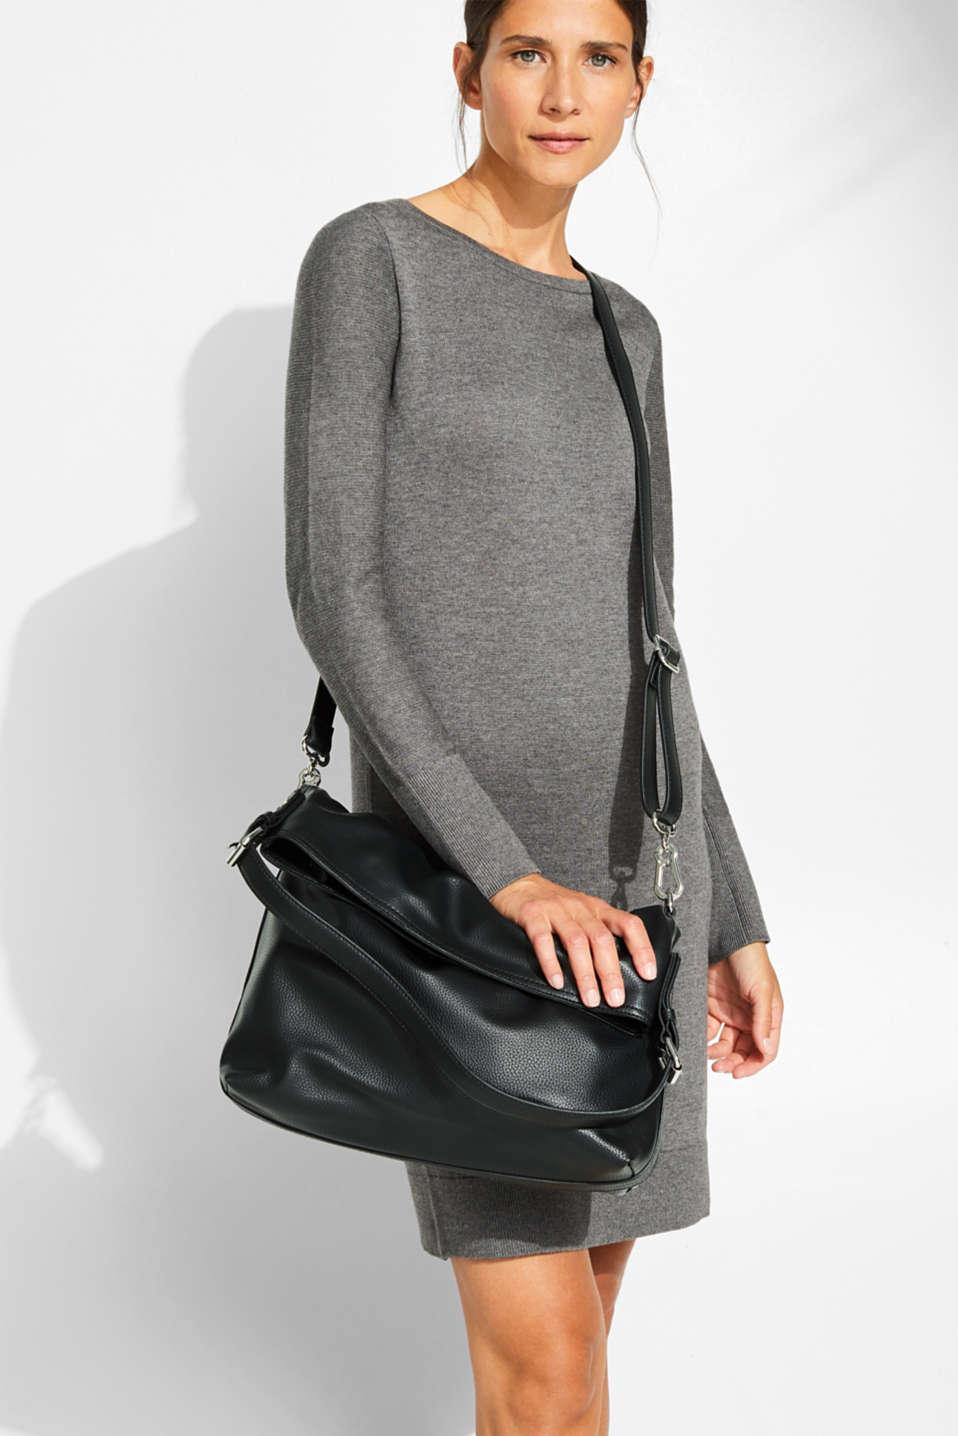 Flap-over bag in vegan faux leather, BLACK, detail image number 1